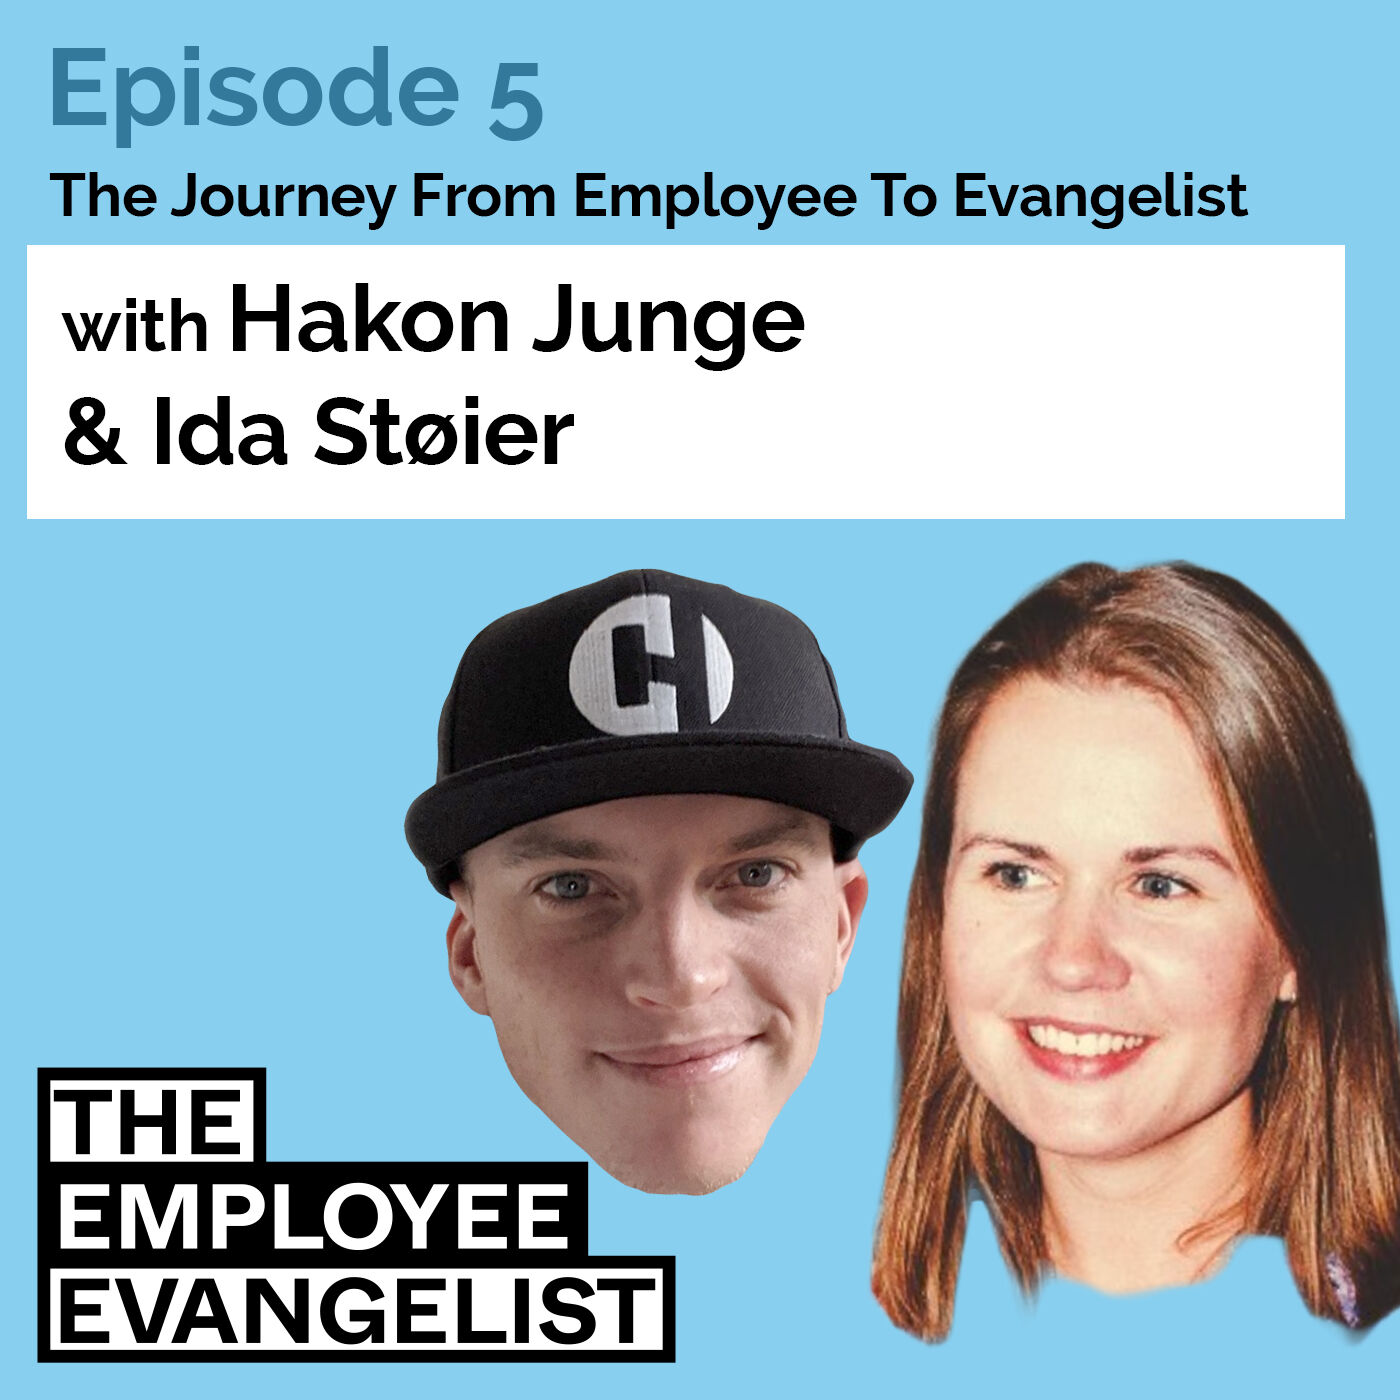 Episode 5: The Employee Evangelist with Ida Støier